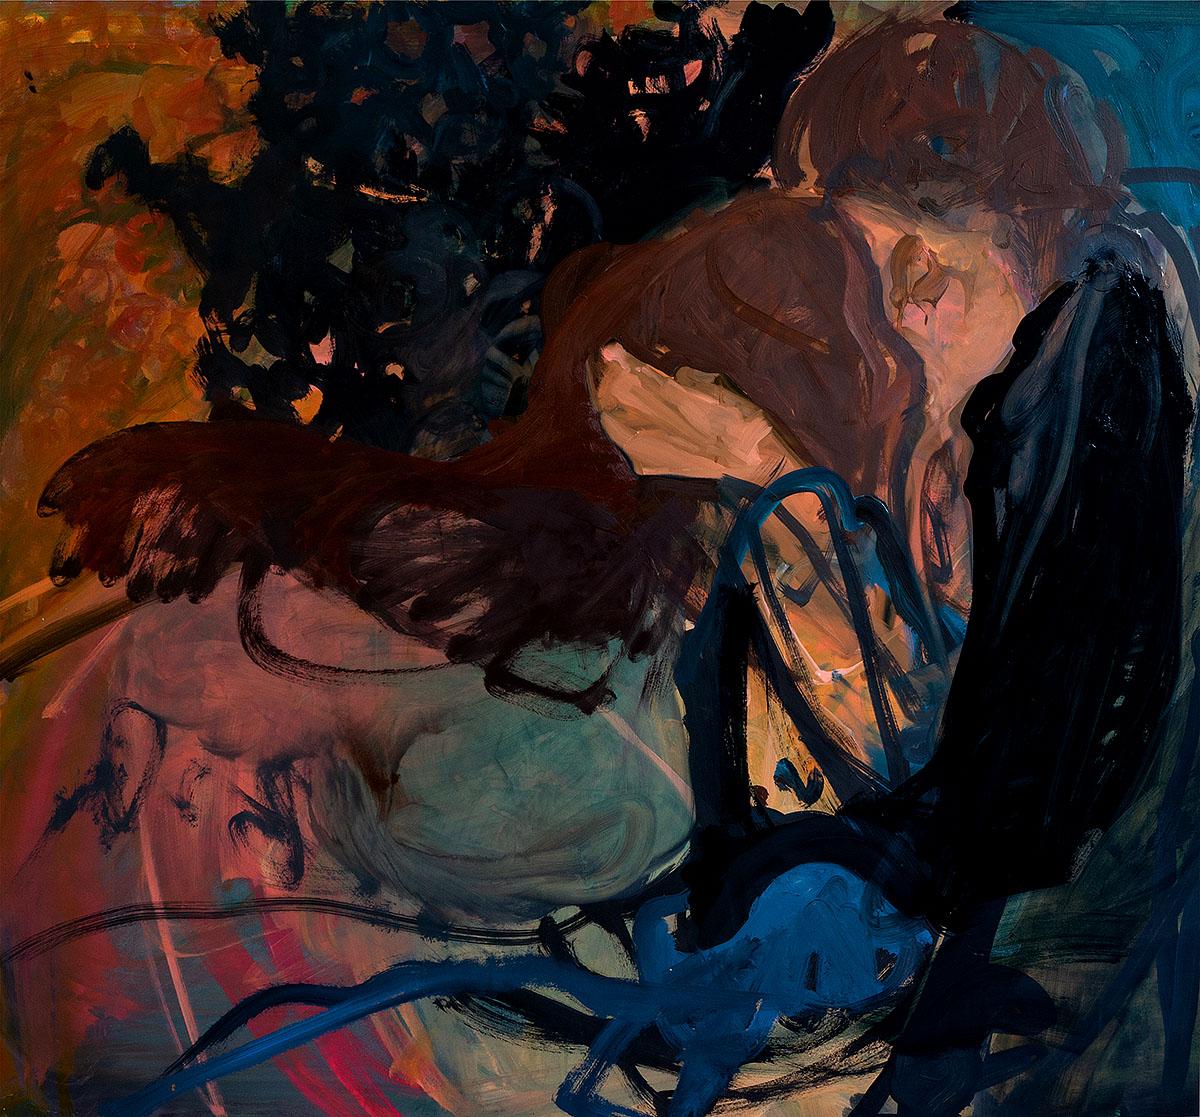 Elaine Speirs: Last Kiss, oil on board